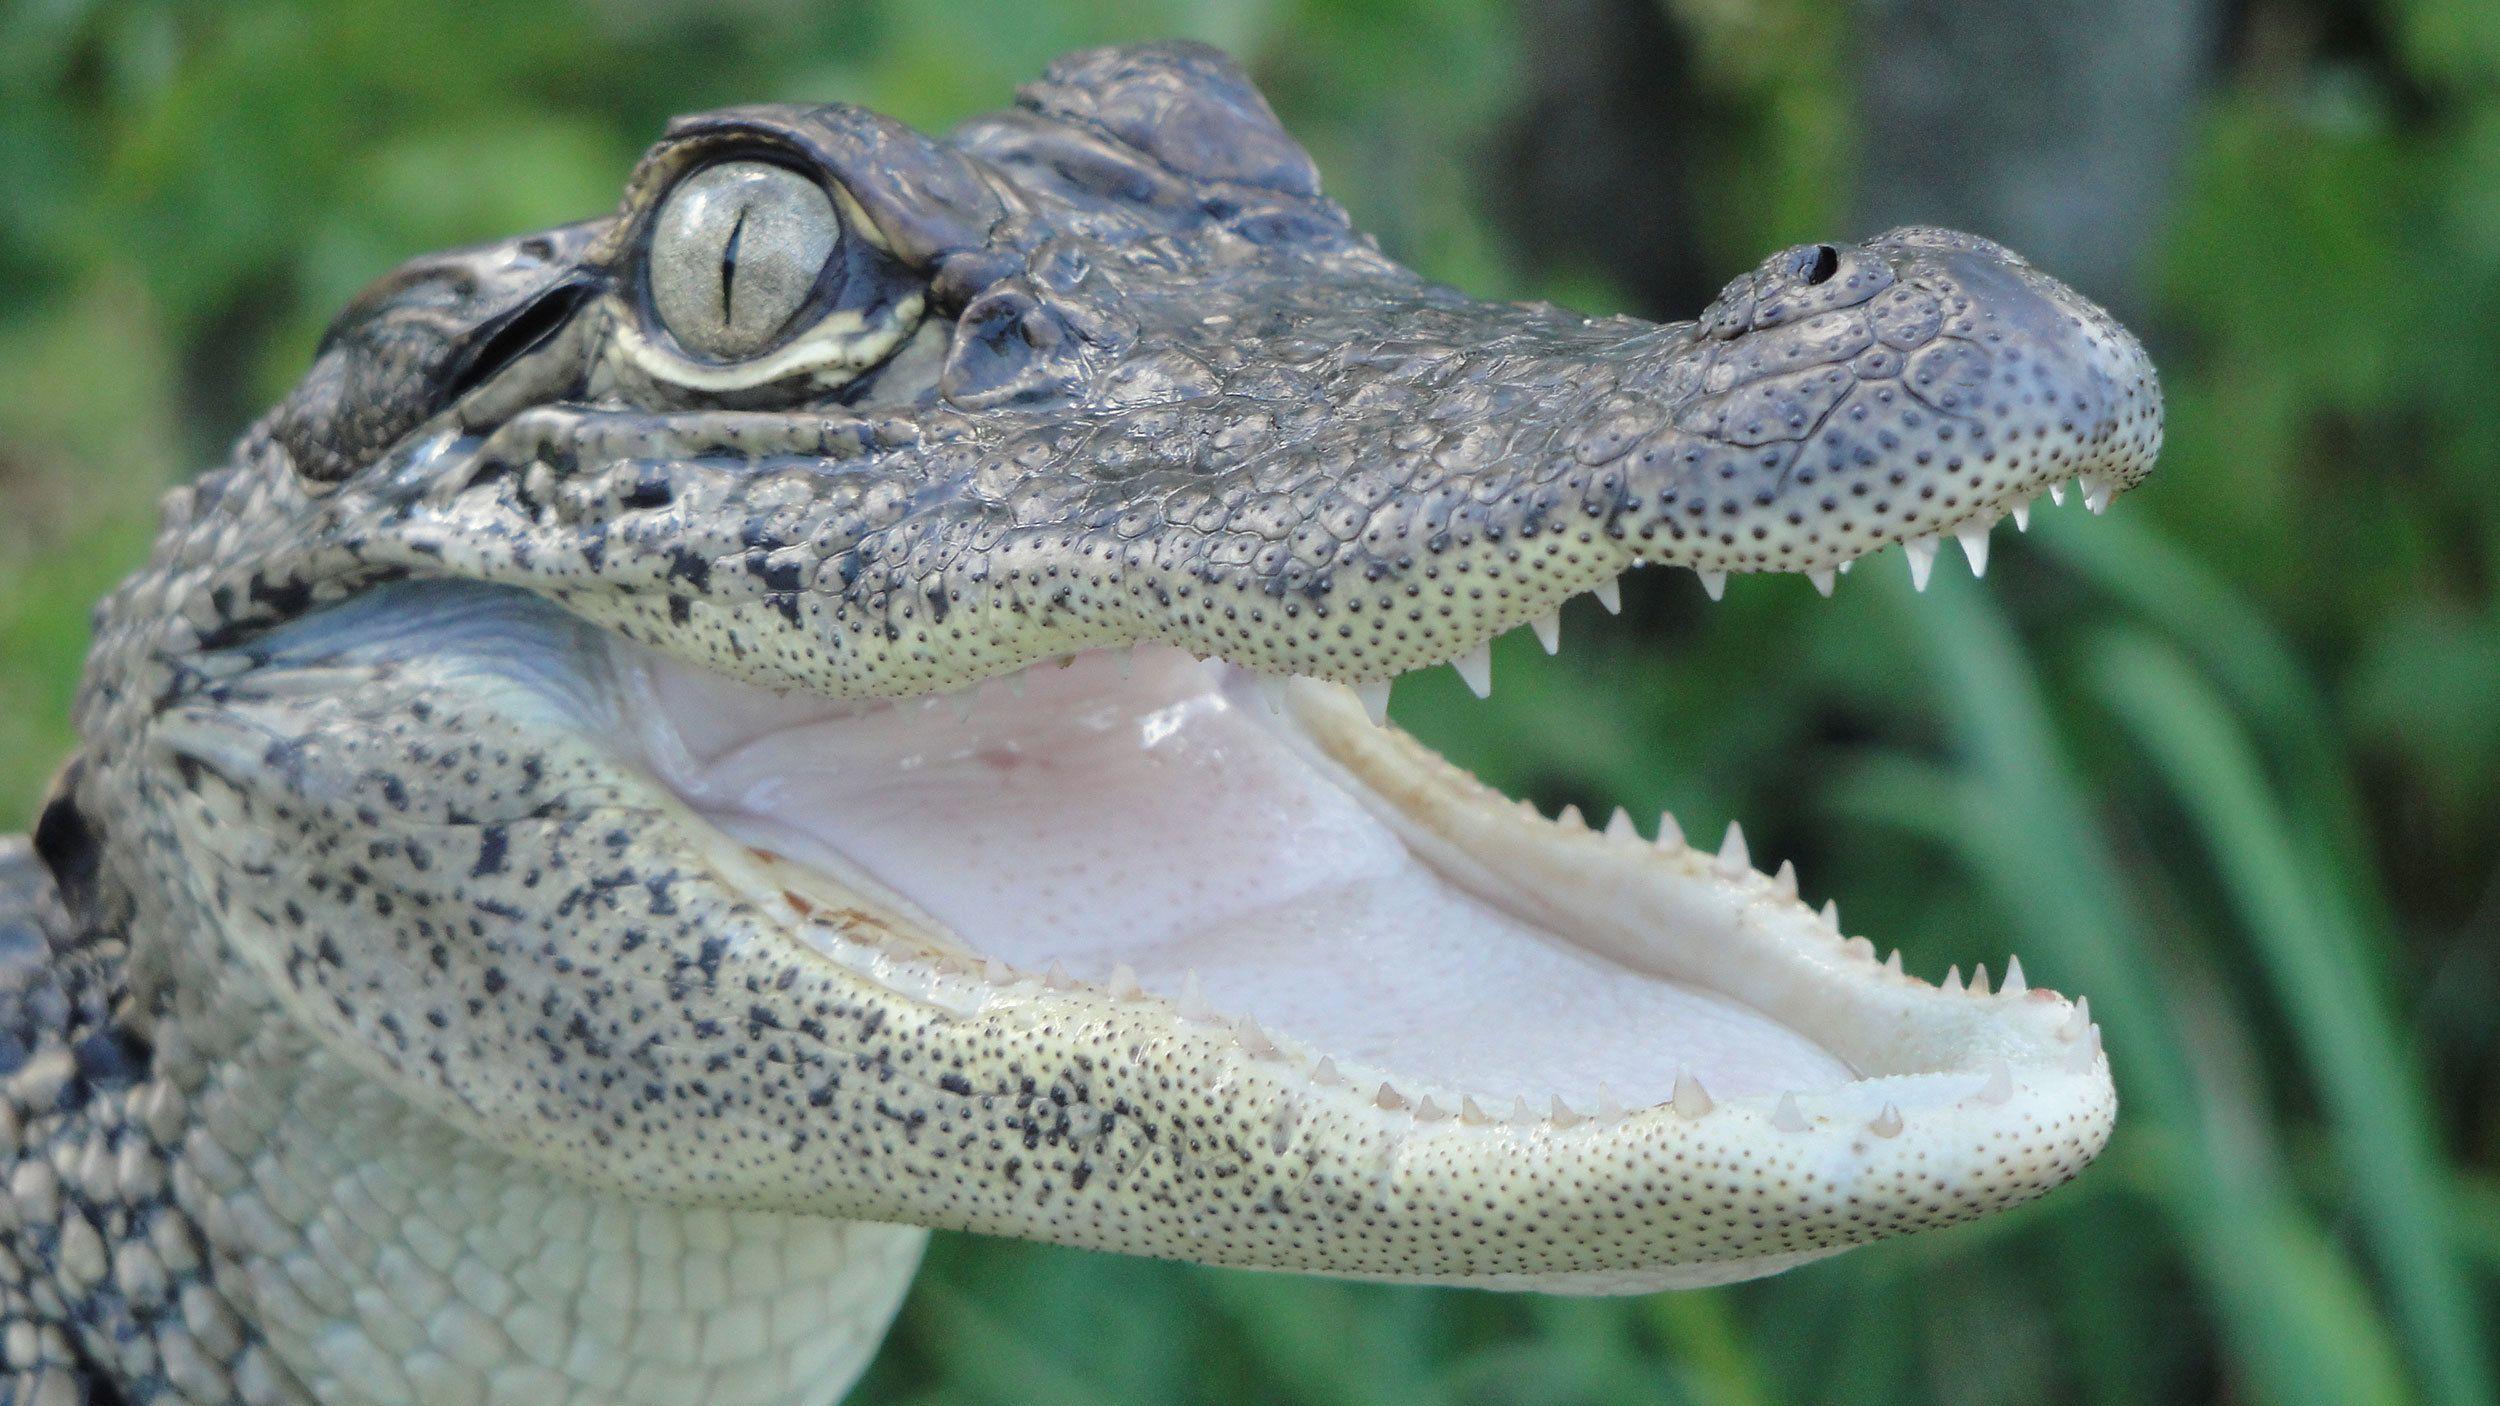 baby alligator in bayou swamp in New Orleans